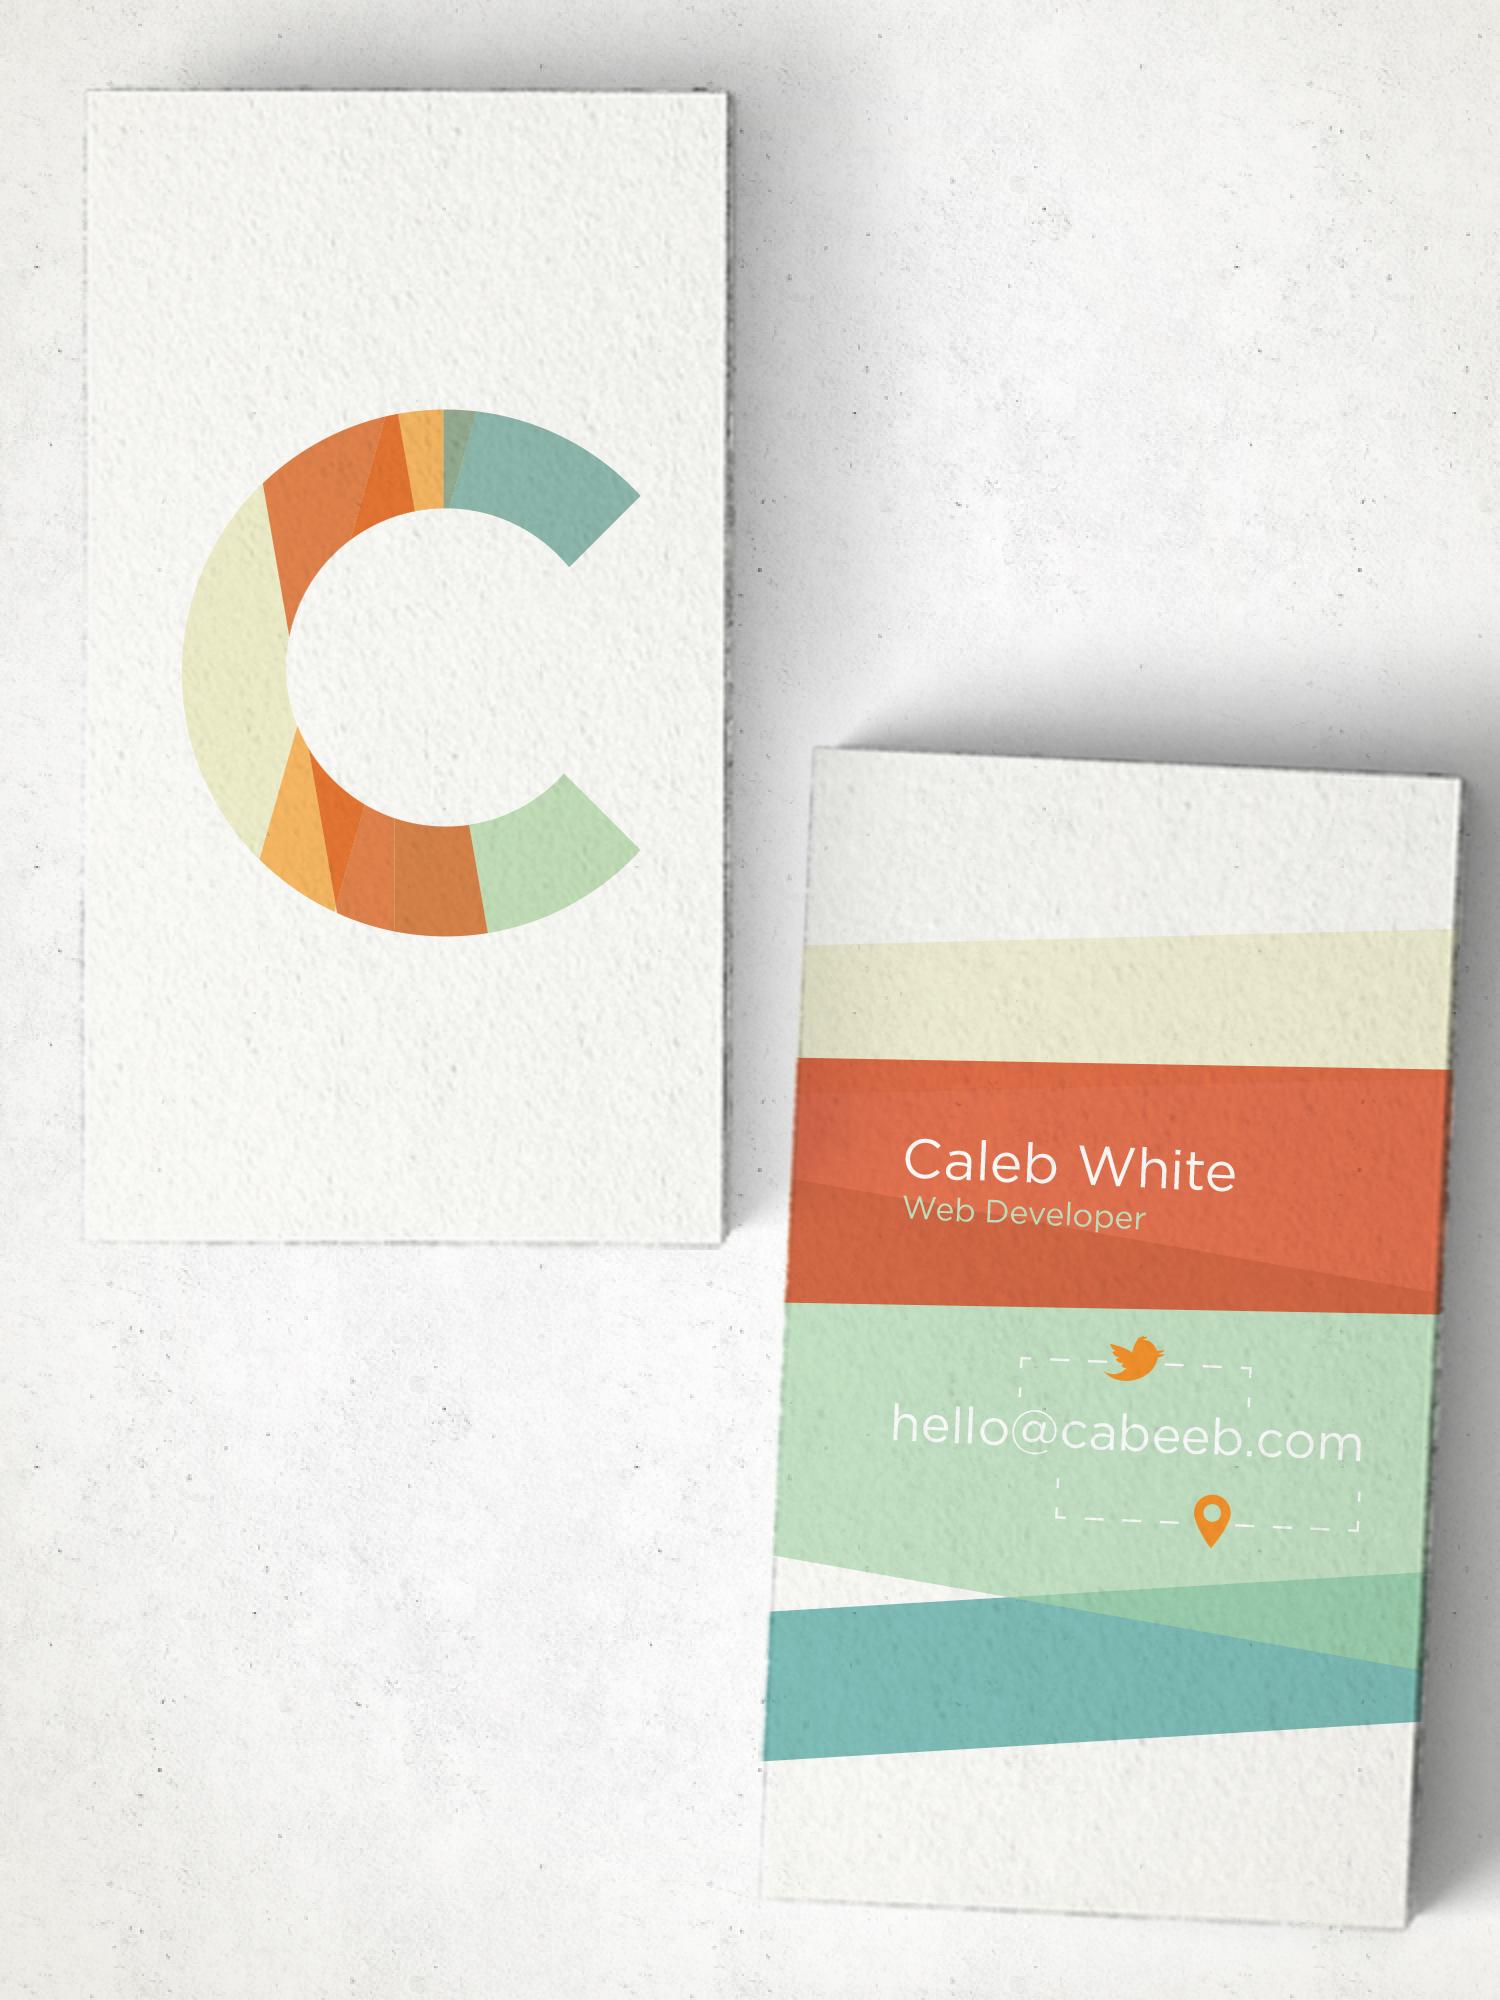 Cabeeb : Freelance web developer and designer, Caleb White.